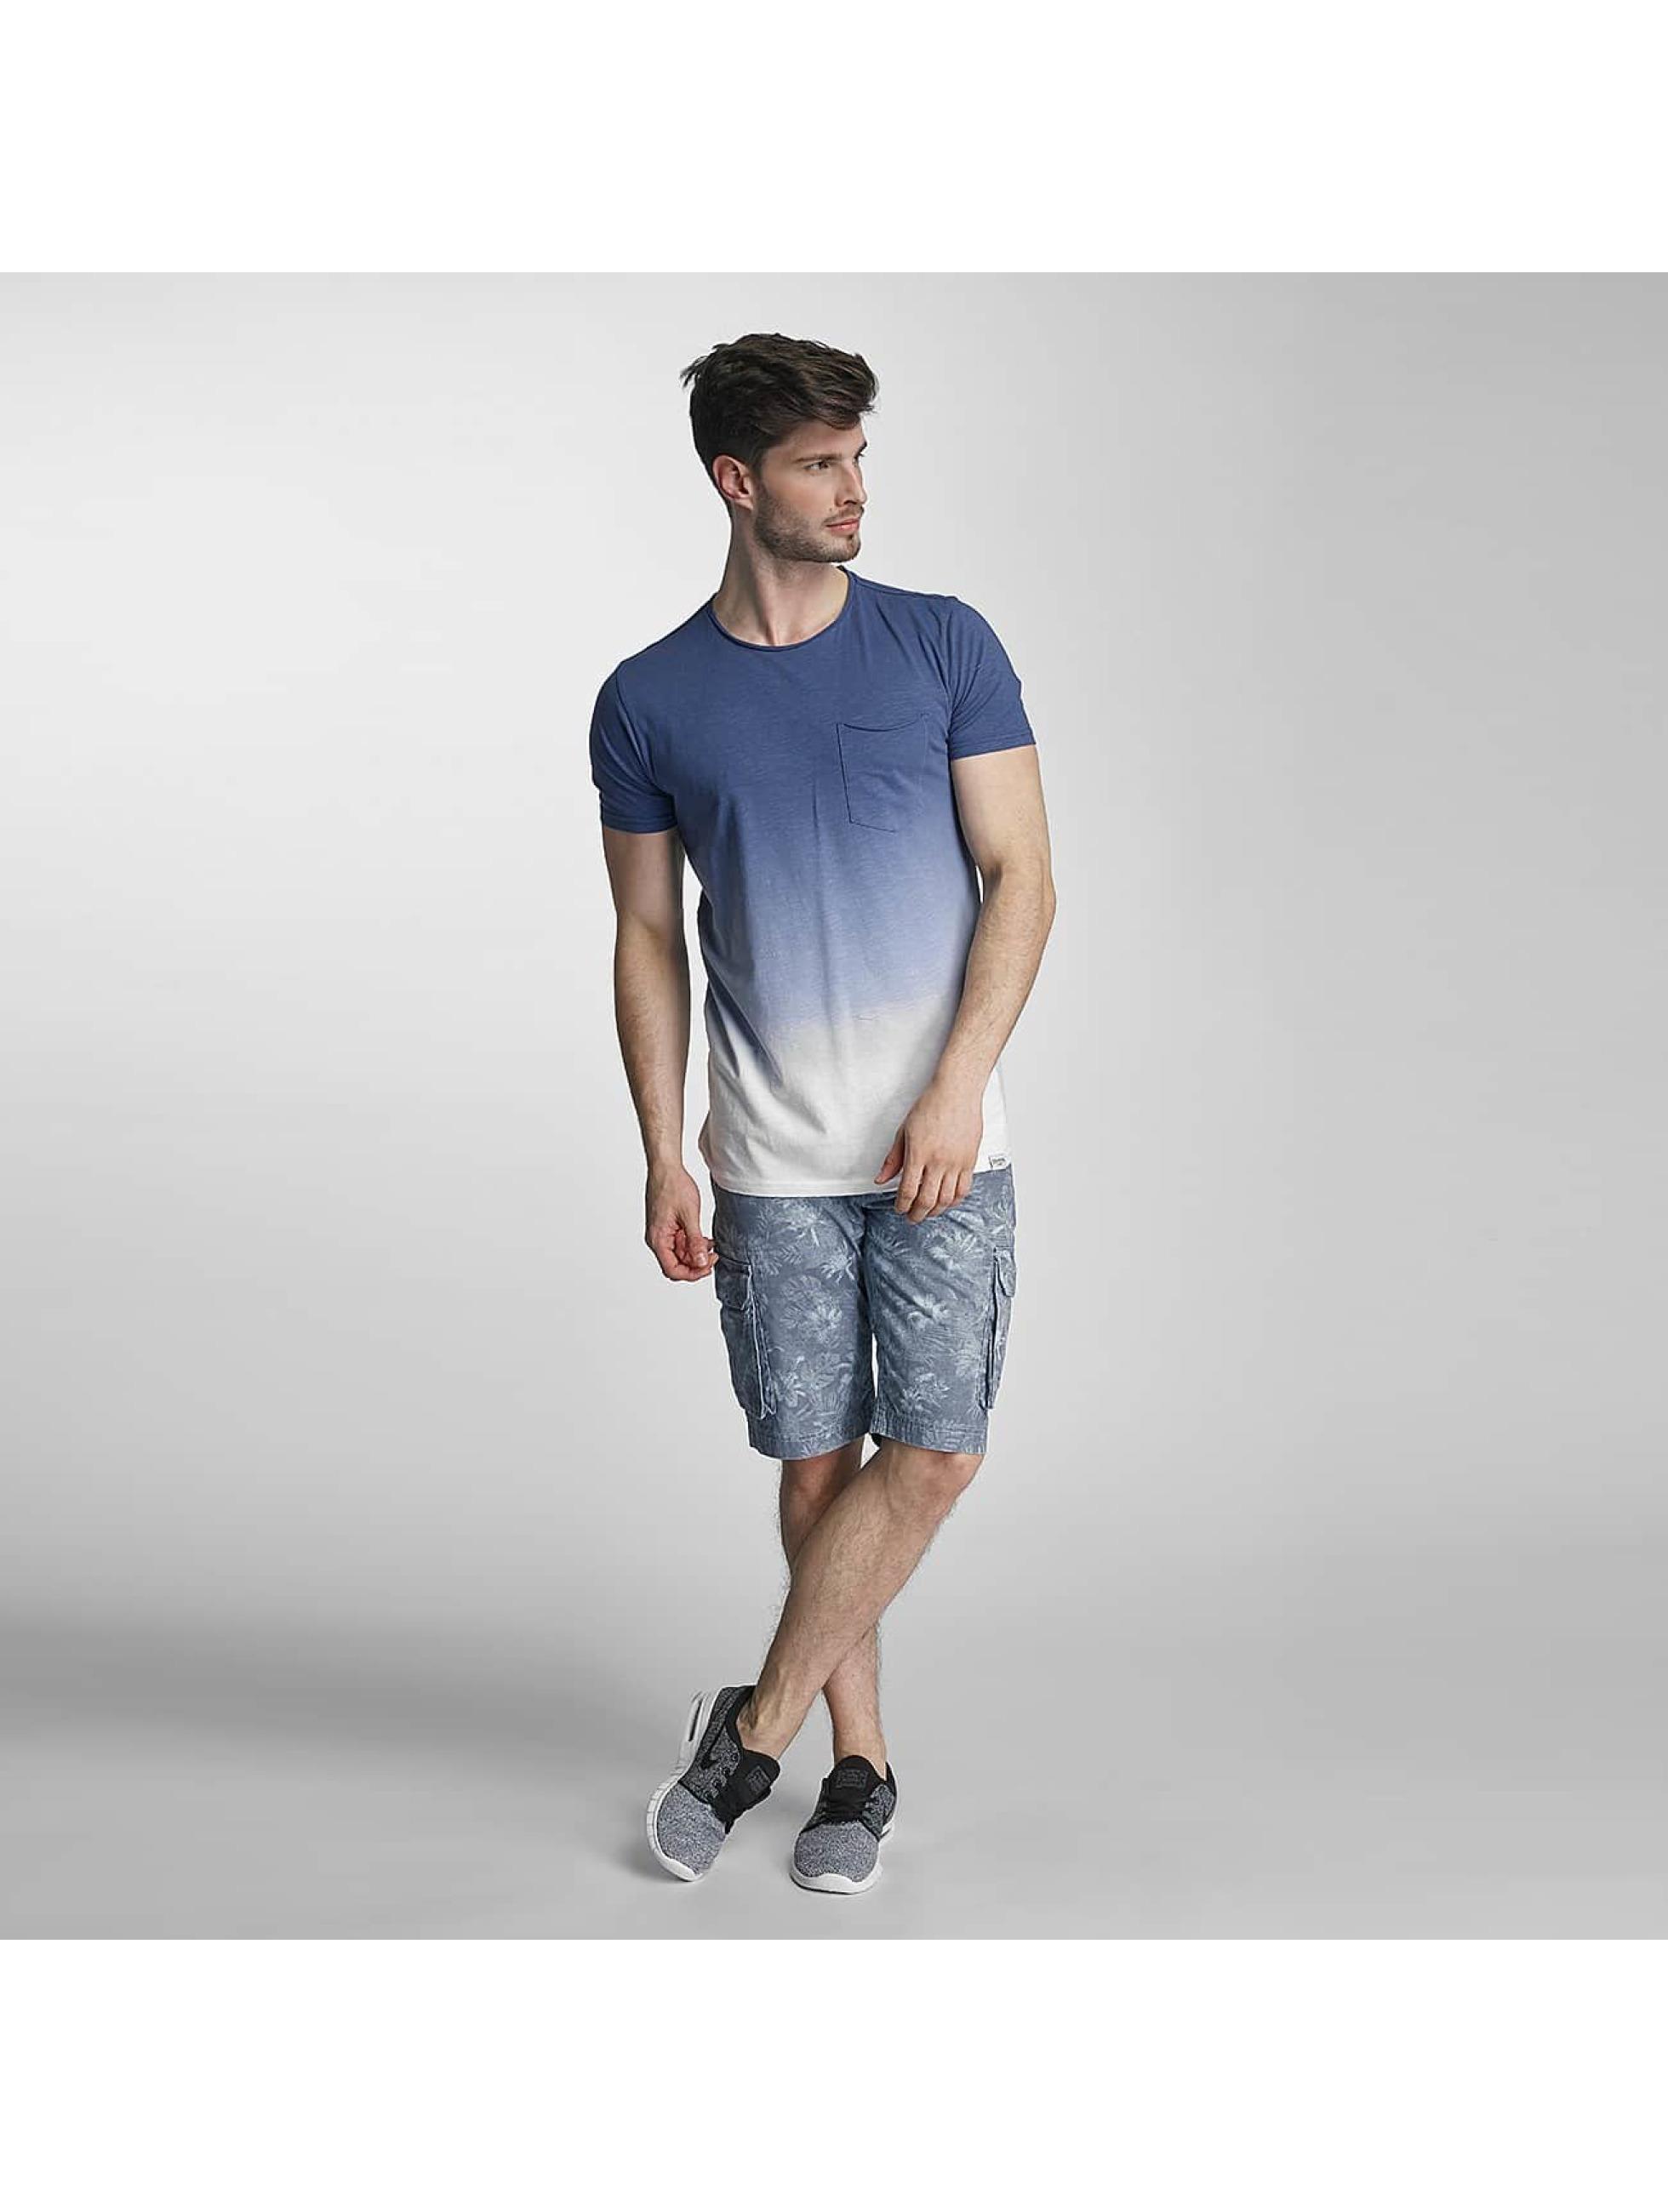 SHINE Original T-Shirt Dip Dyed blue